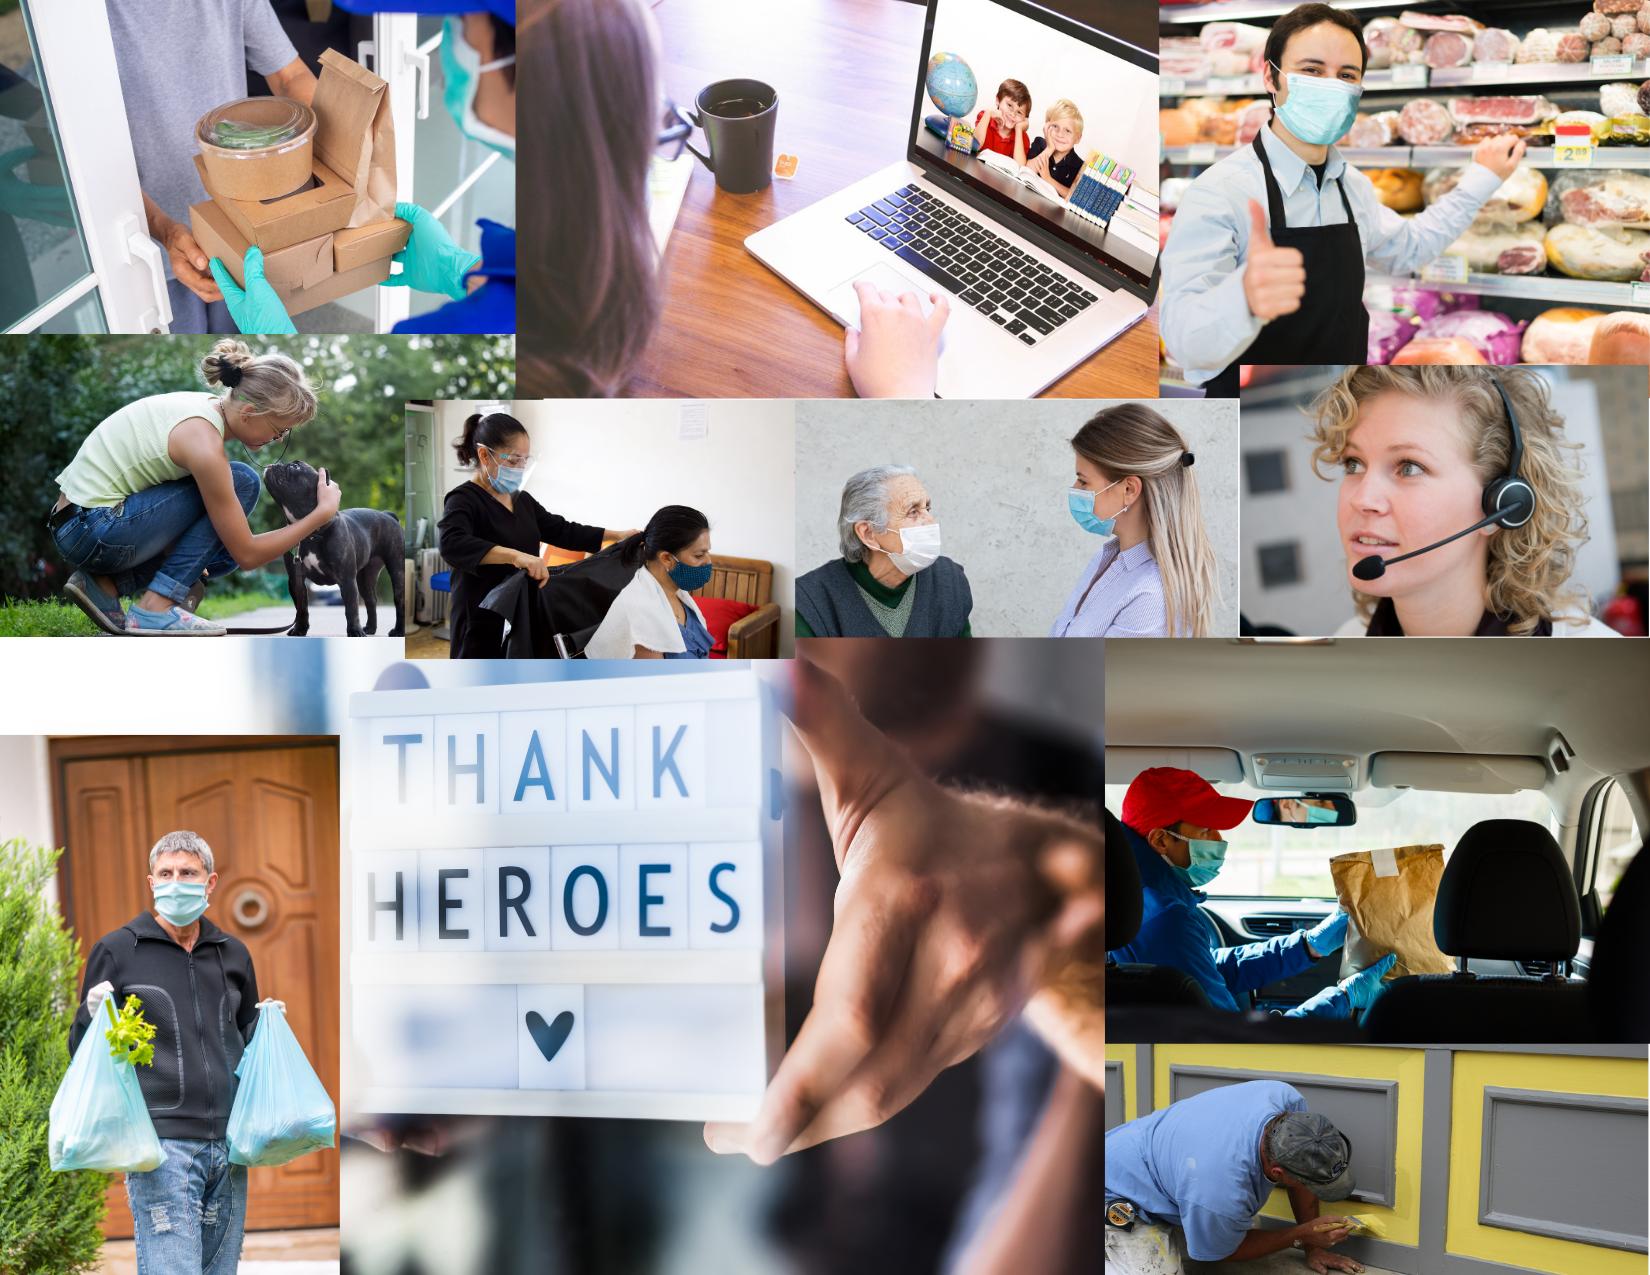 collage of various people from the community_nurses_volunteers_workers